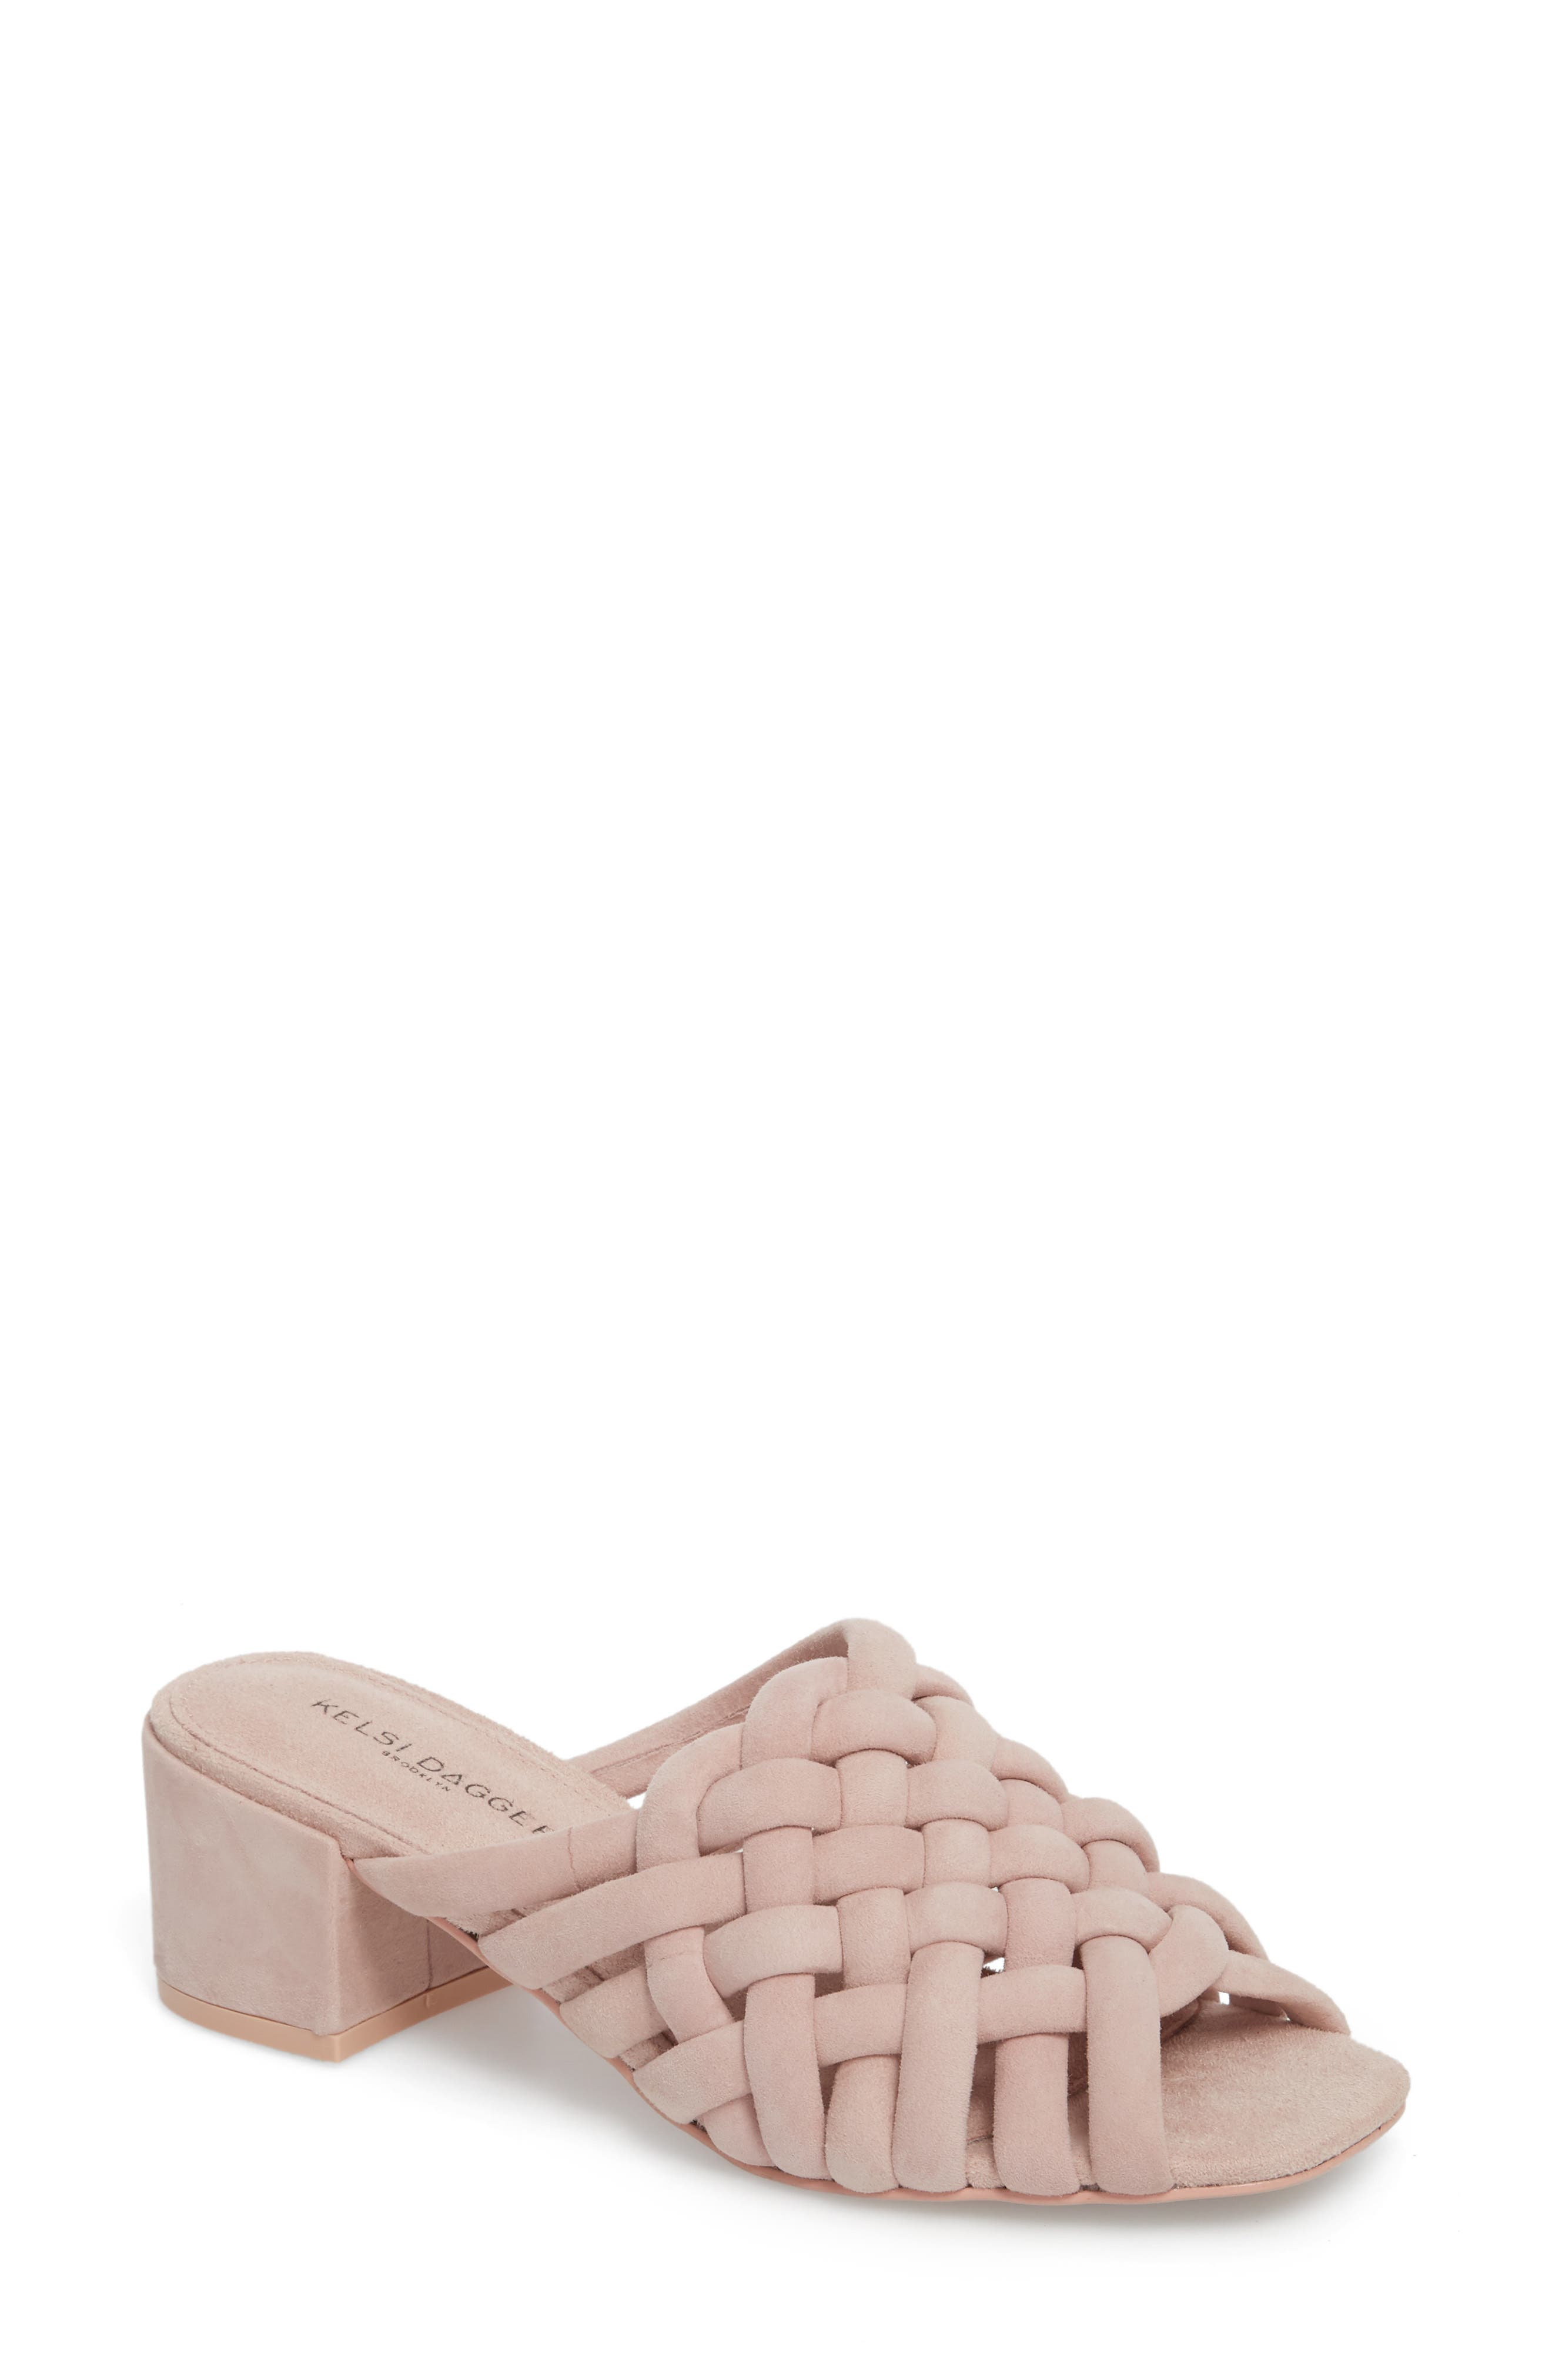 Sky Dress Woven Mule Sandal,                             Main thumbnail 1, color,                             Pale Pink